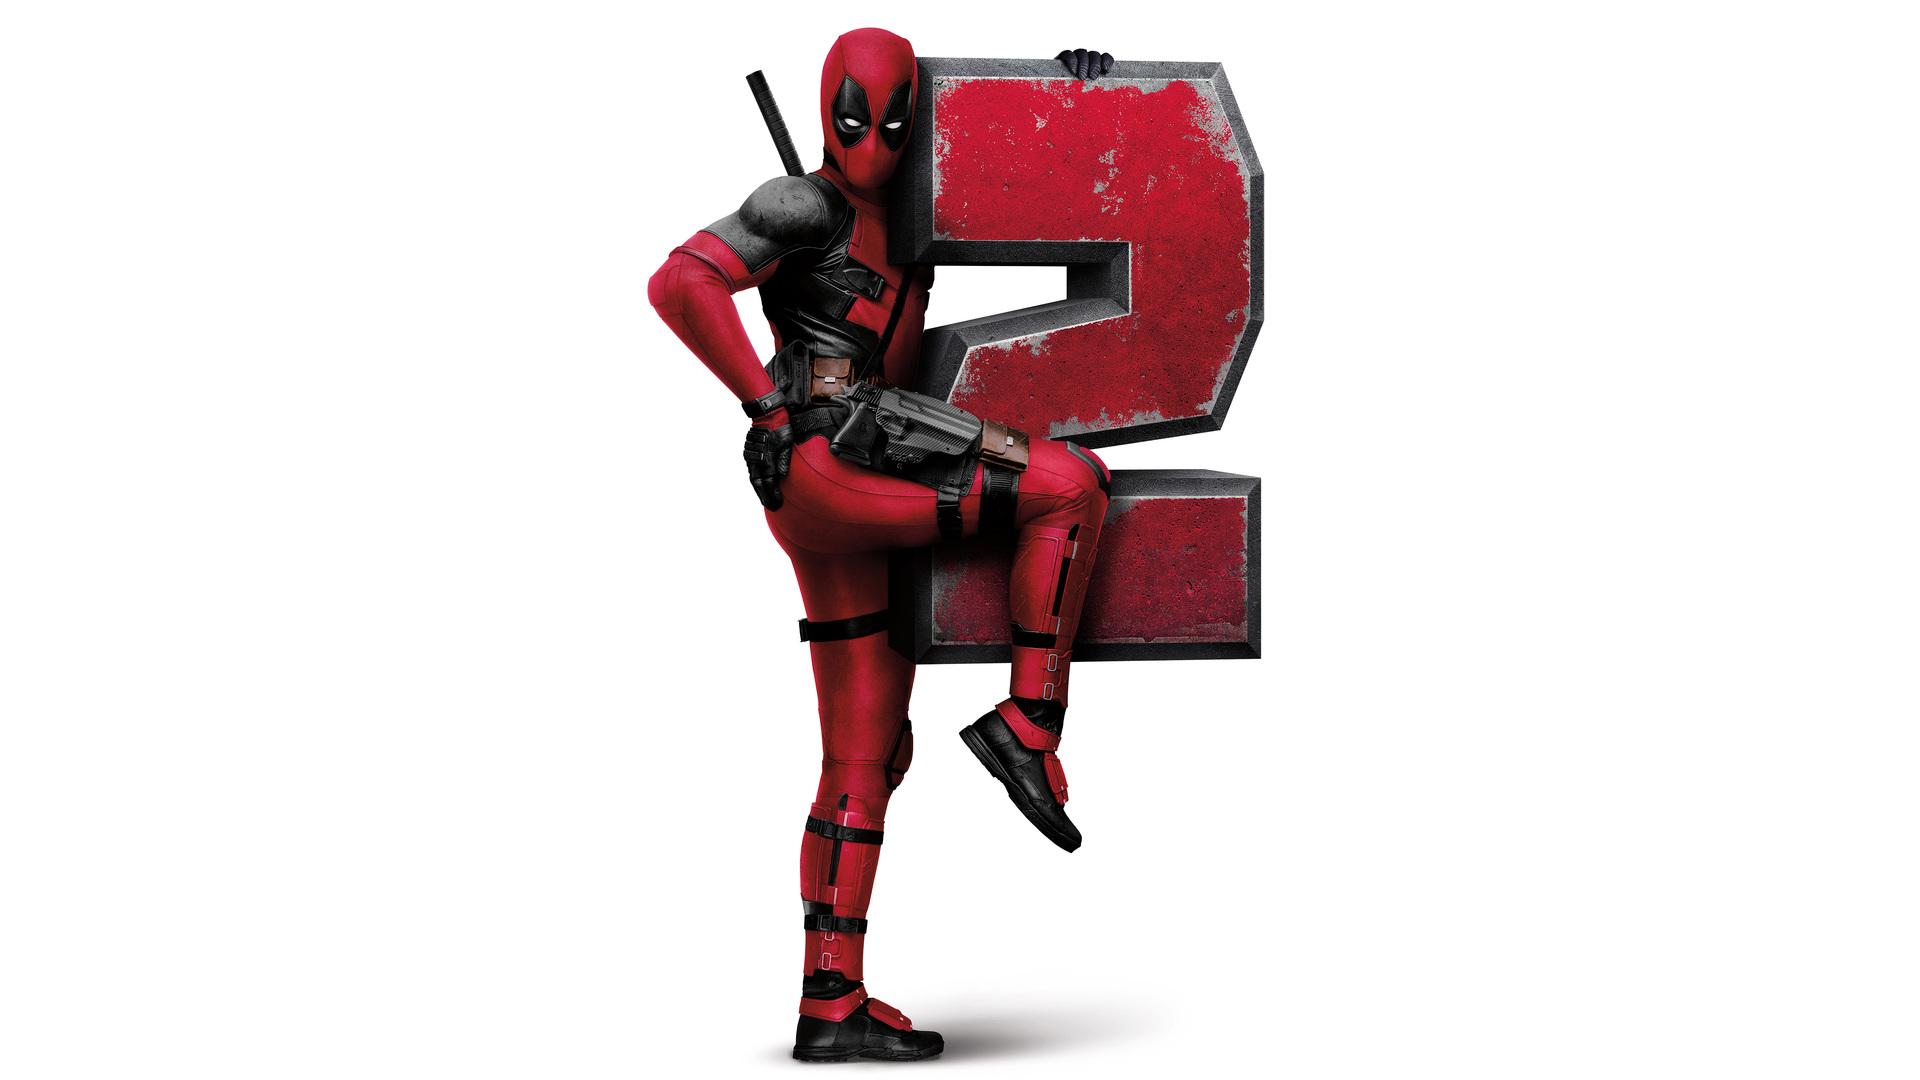 1920x1080 Deadpool 2 5k Poster Laptop Full HD 1080P HD 4k ...